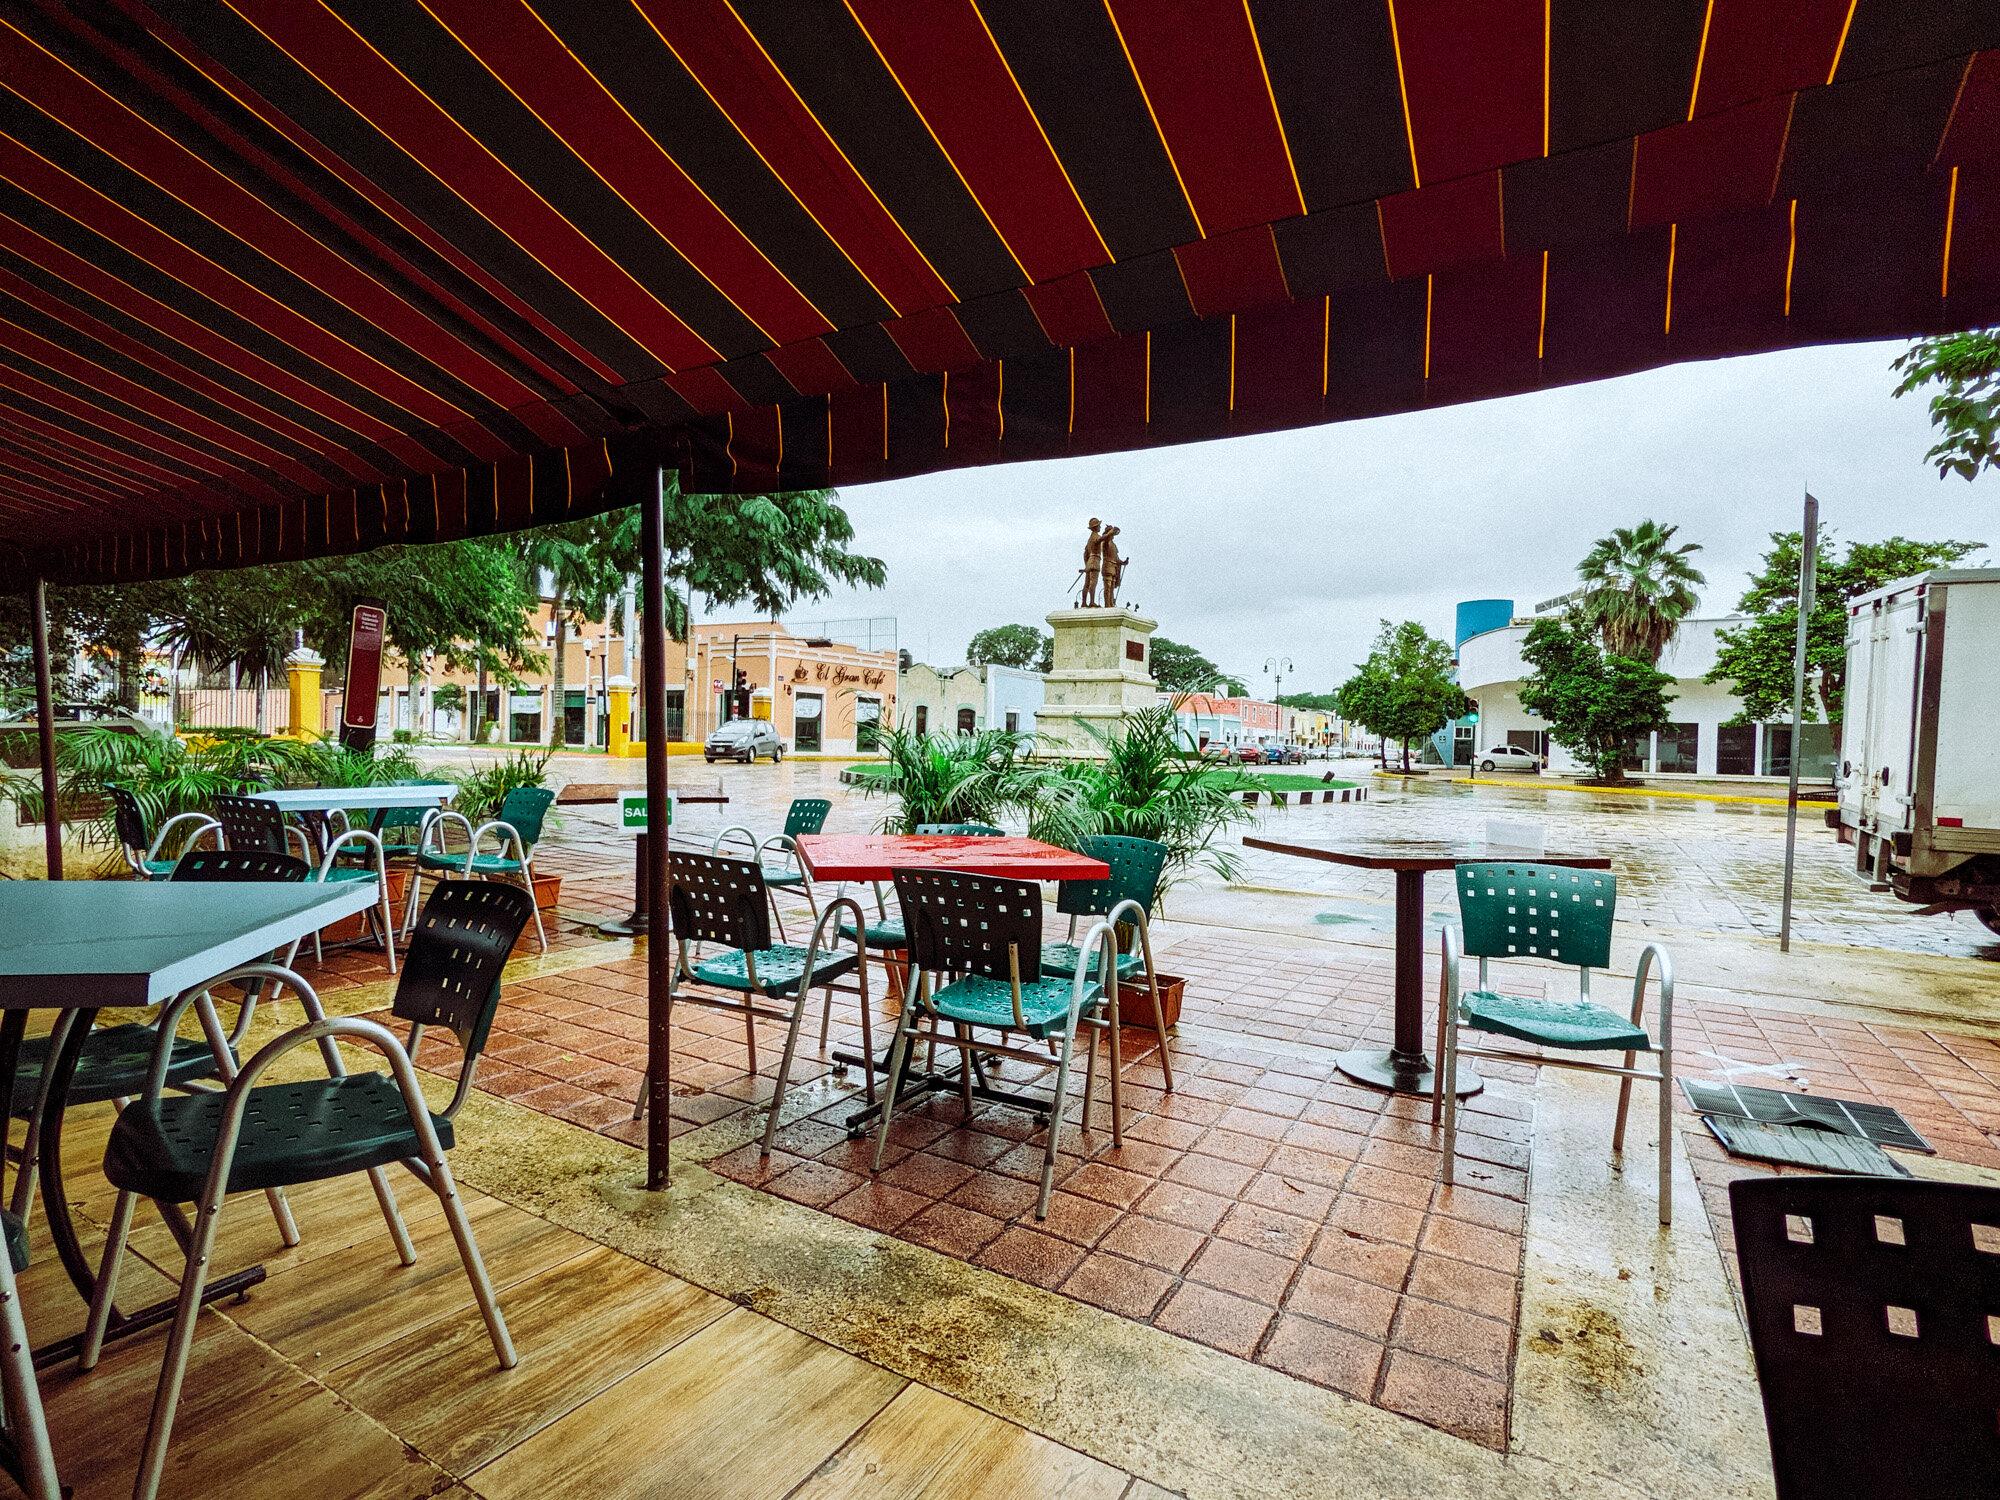 Rachel Off Duty: View of Paseo de Montejo from a Cafe in Merida